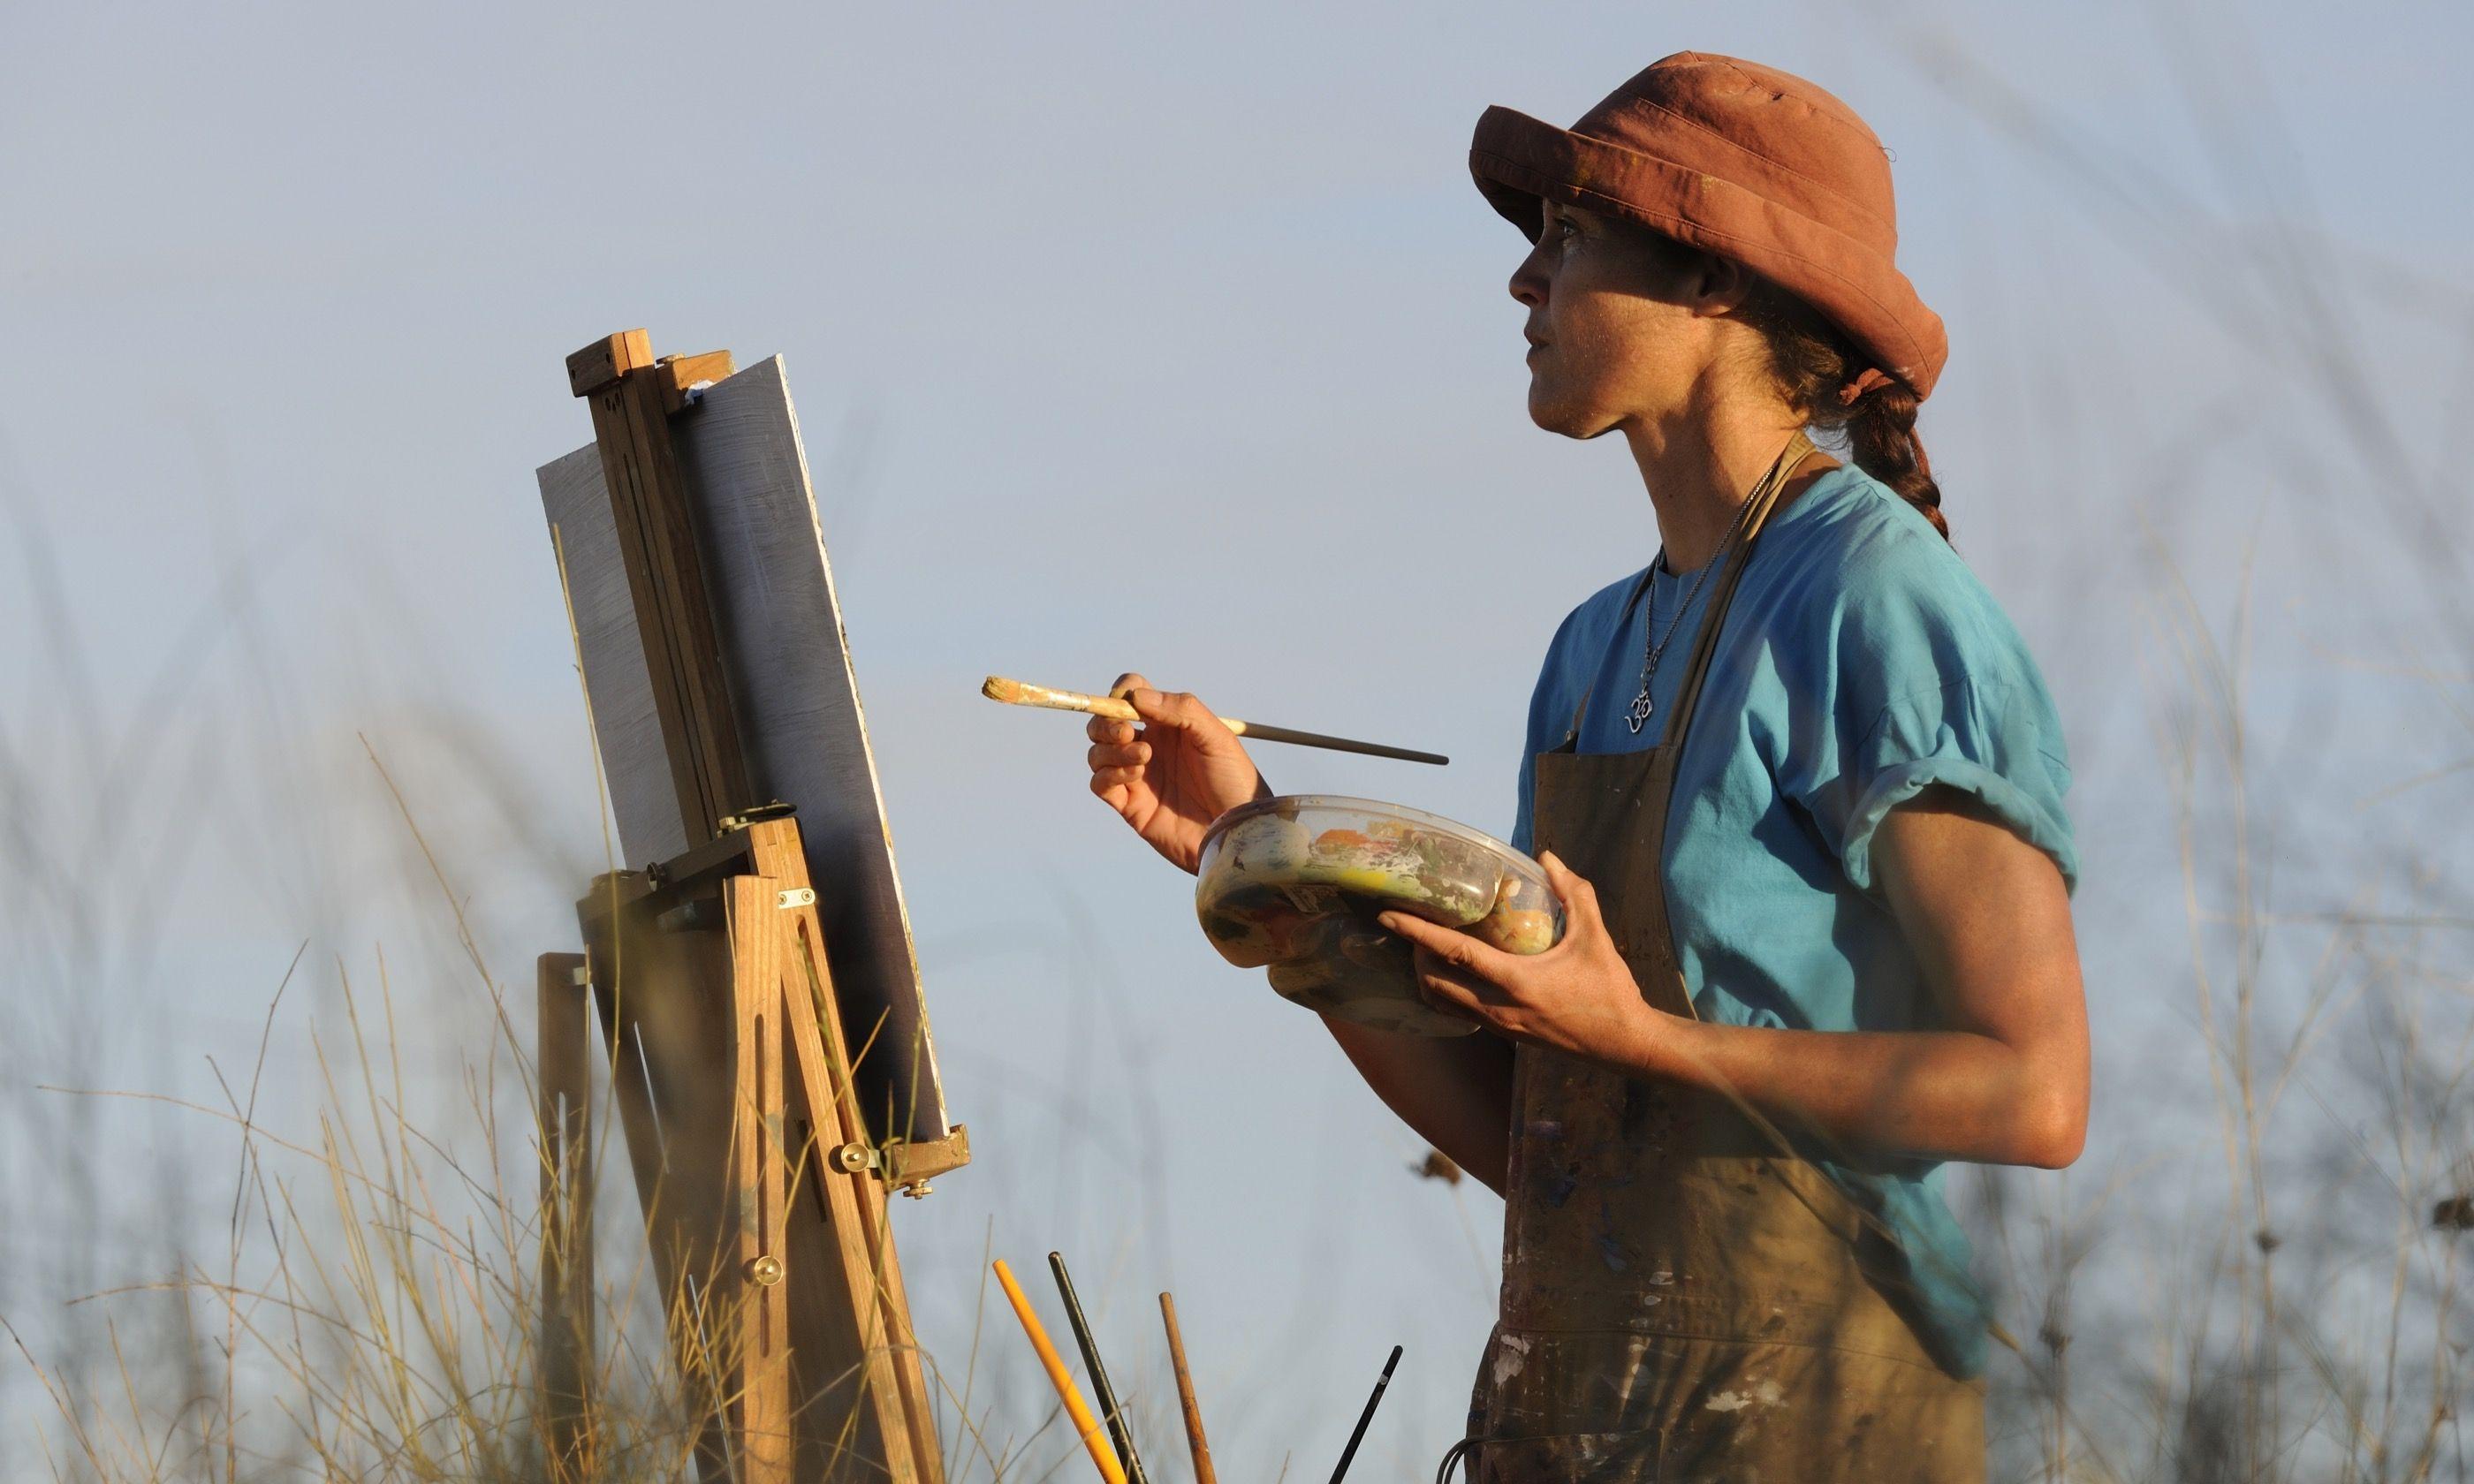 Painting a landscape (Shutterstock.com)